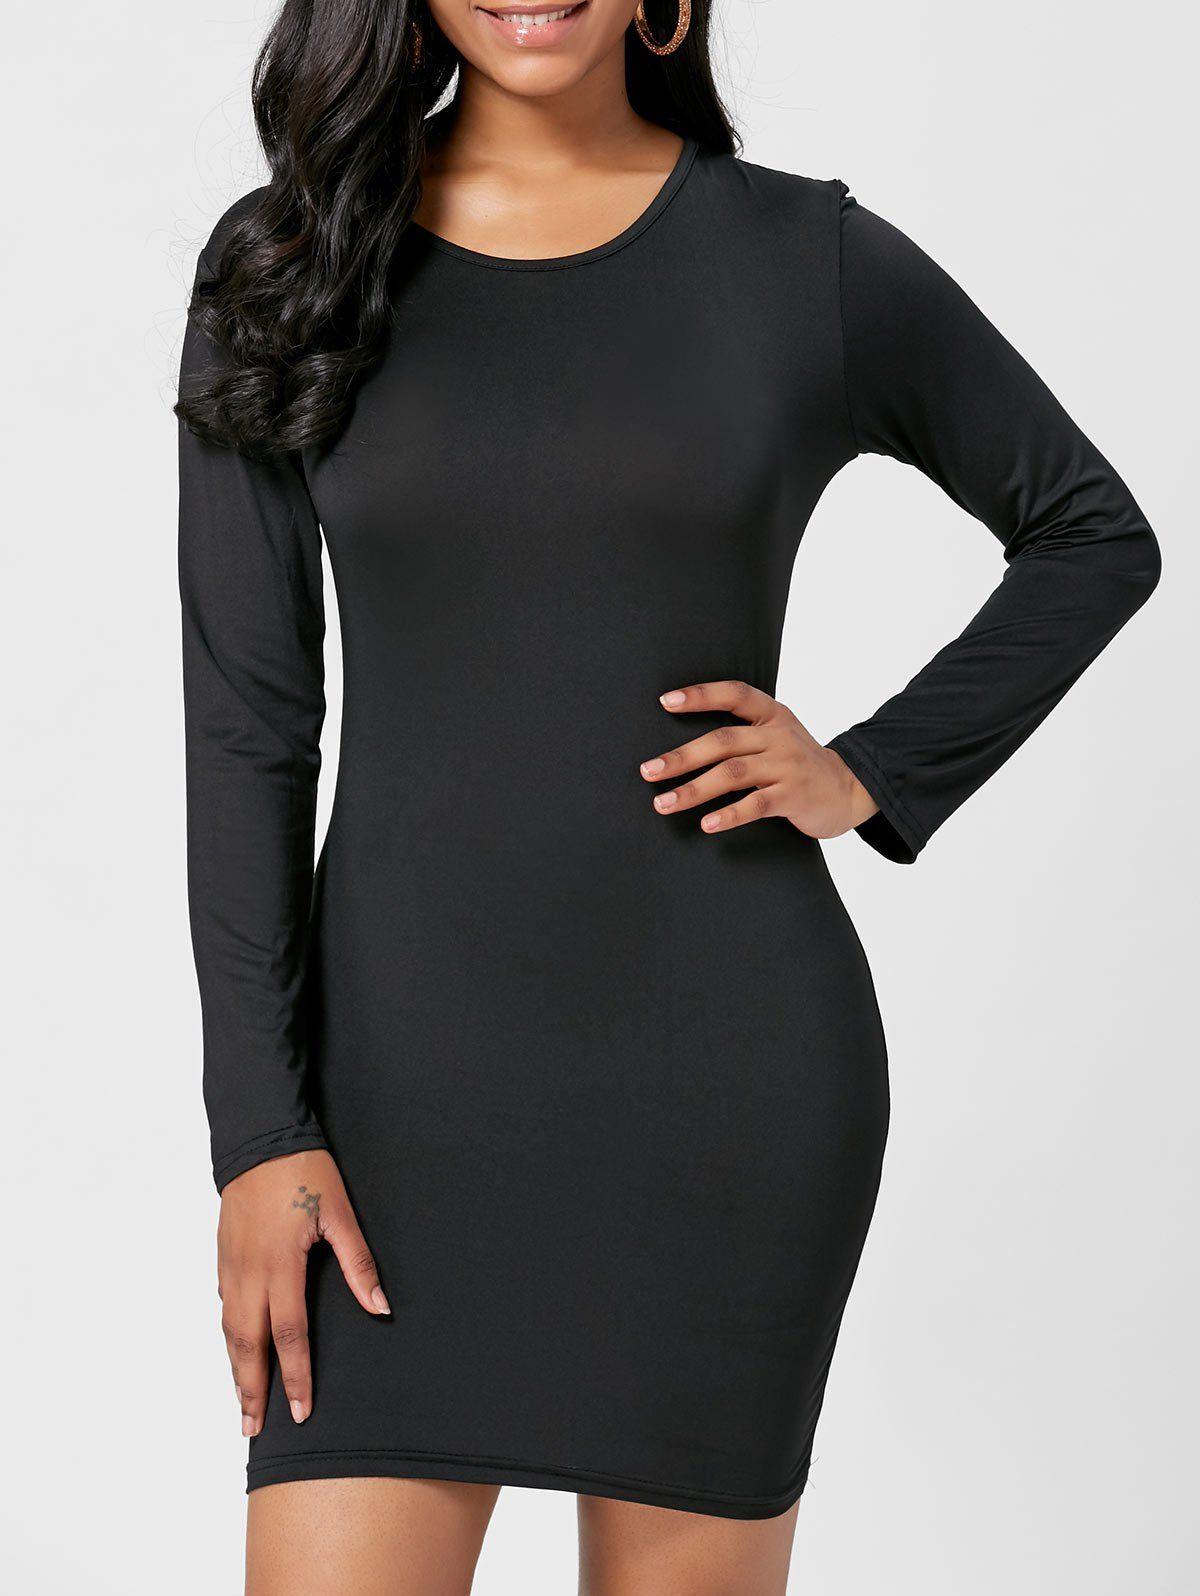 Long sleeve short bodycon dress black m shoproads